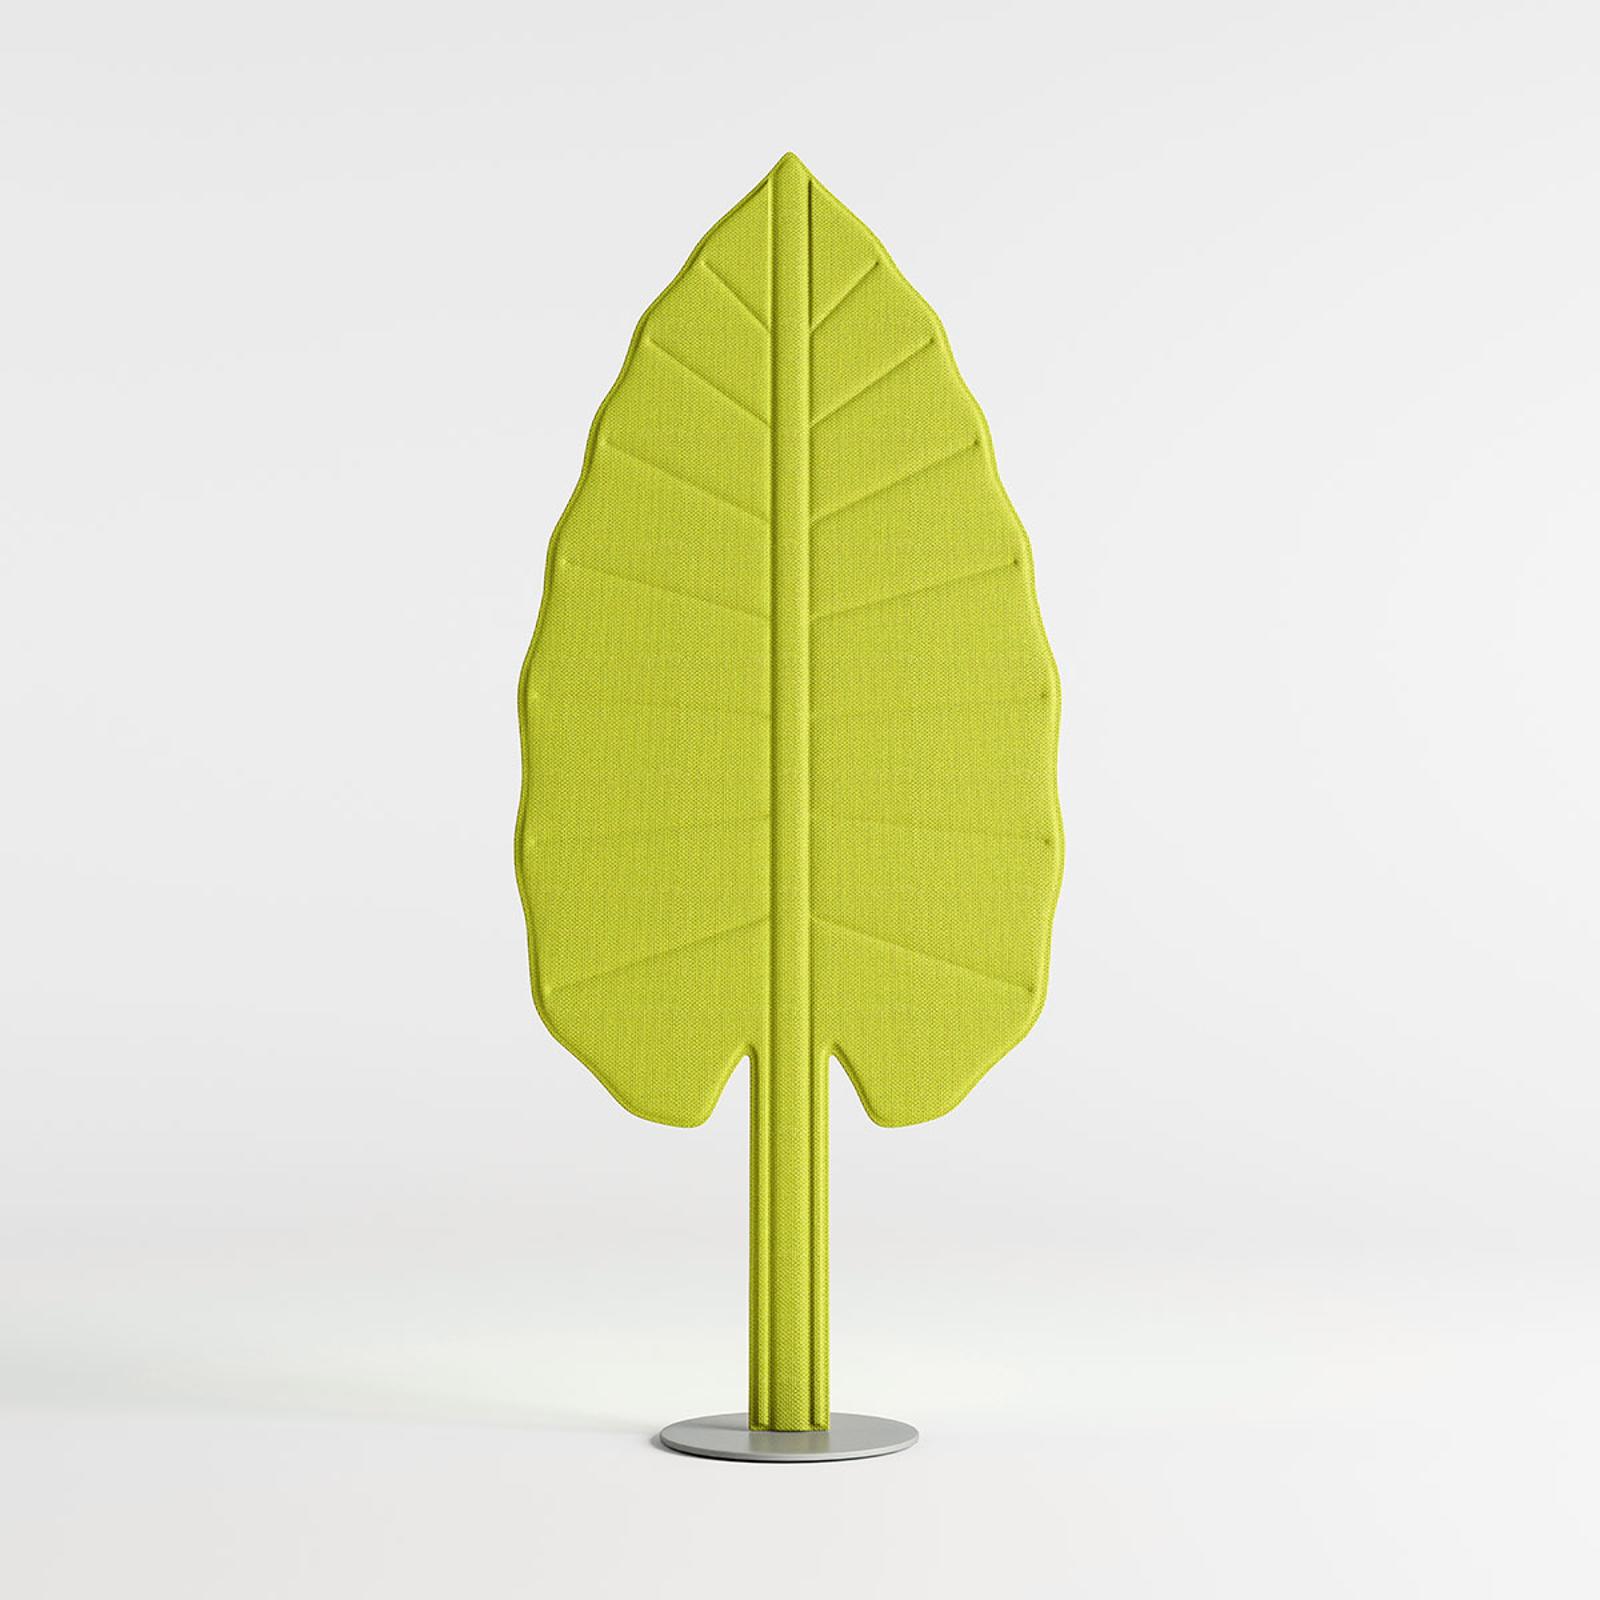 Rotaliana Eden Alocasia LED-Stehleuchte, hellgrün